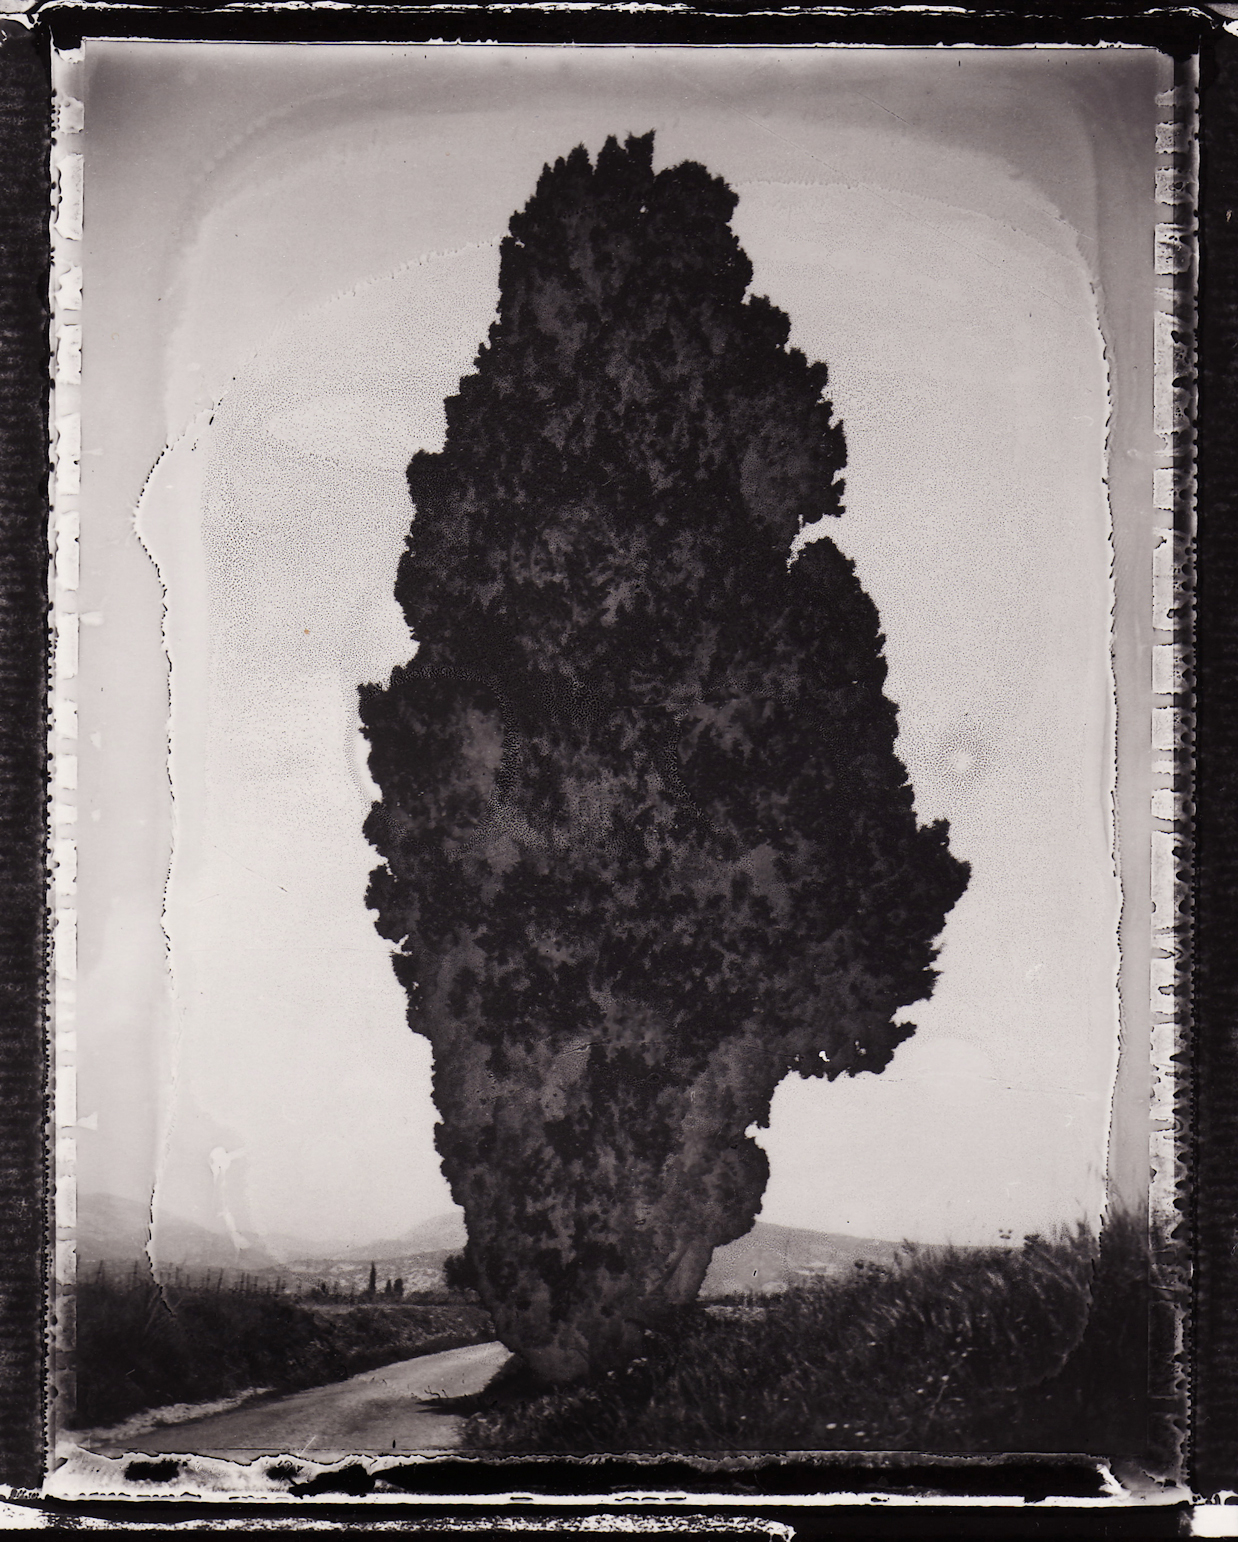 Pola-arbre 13.jpg